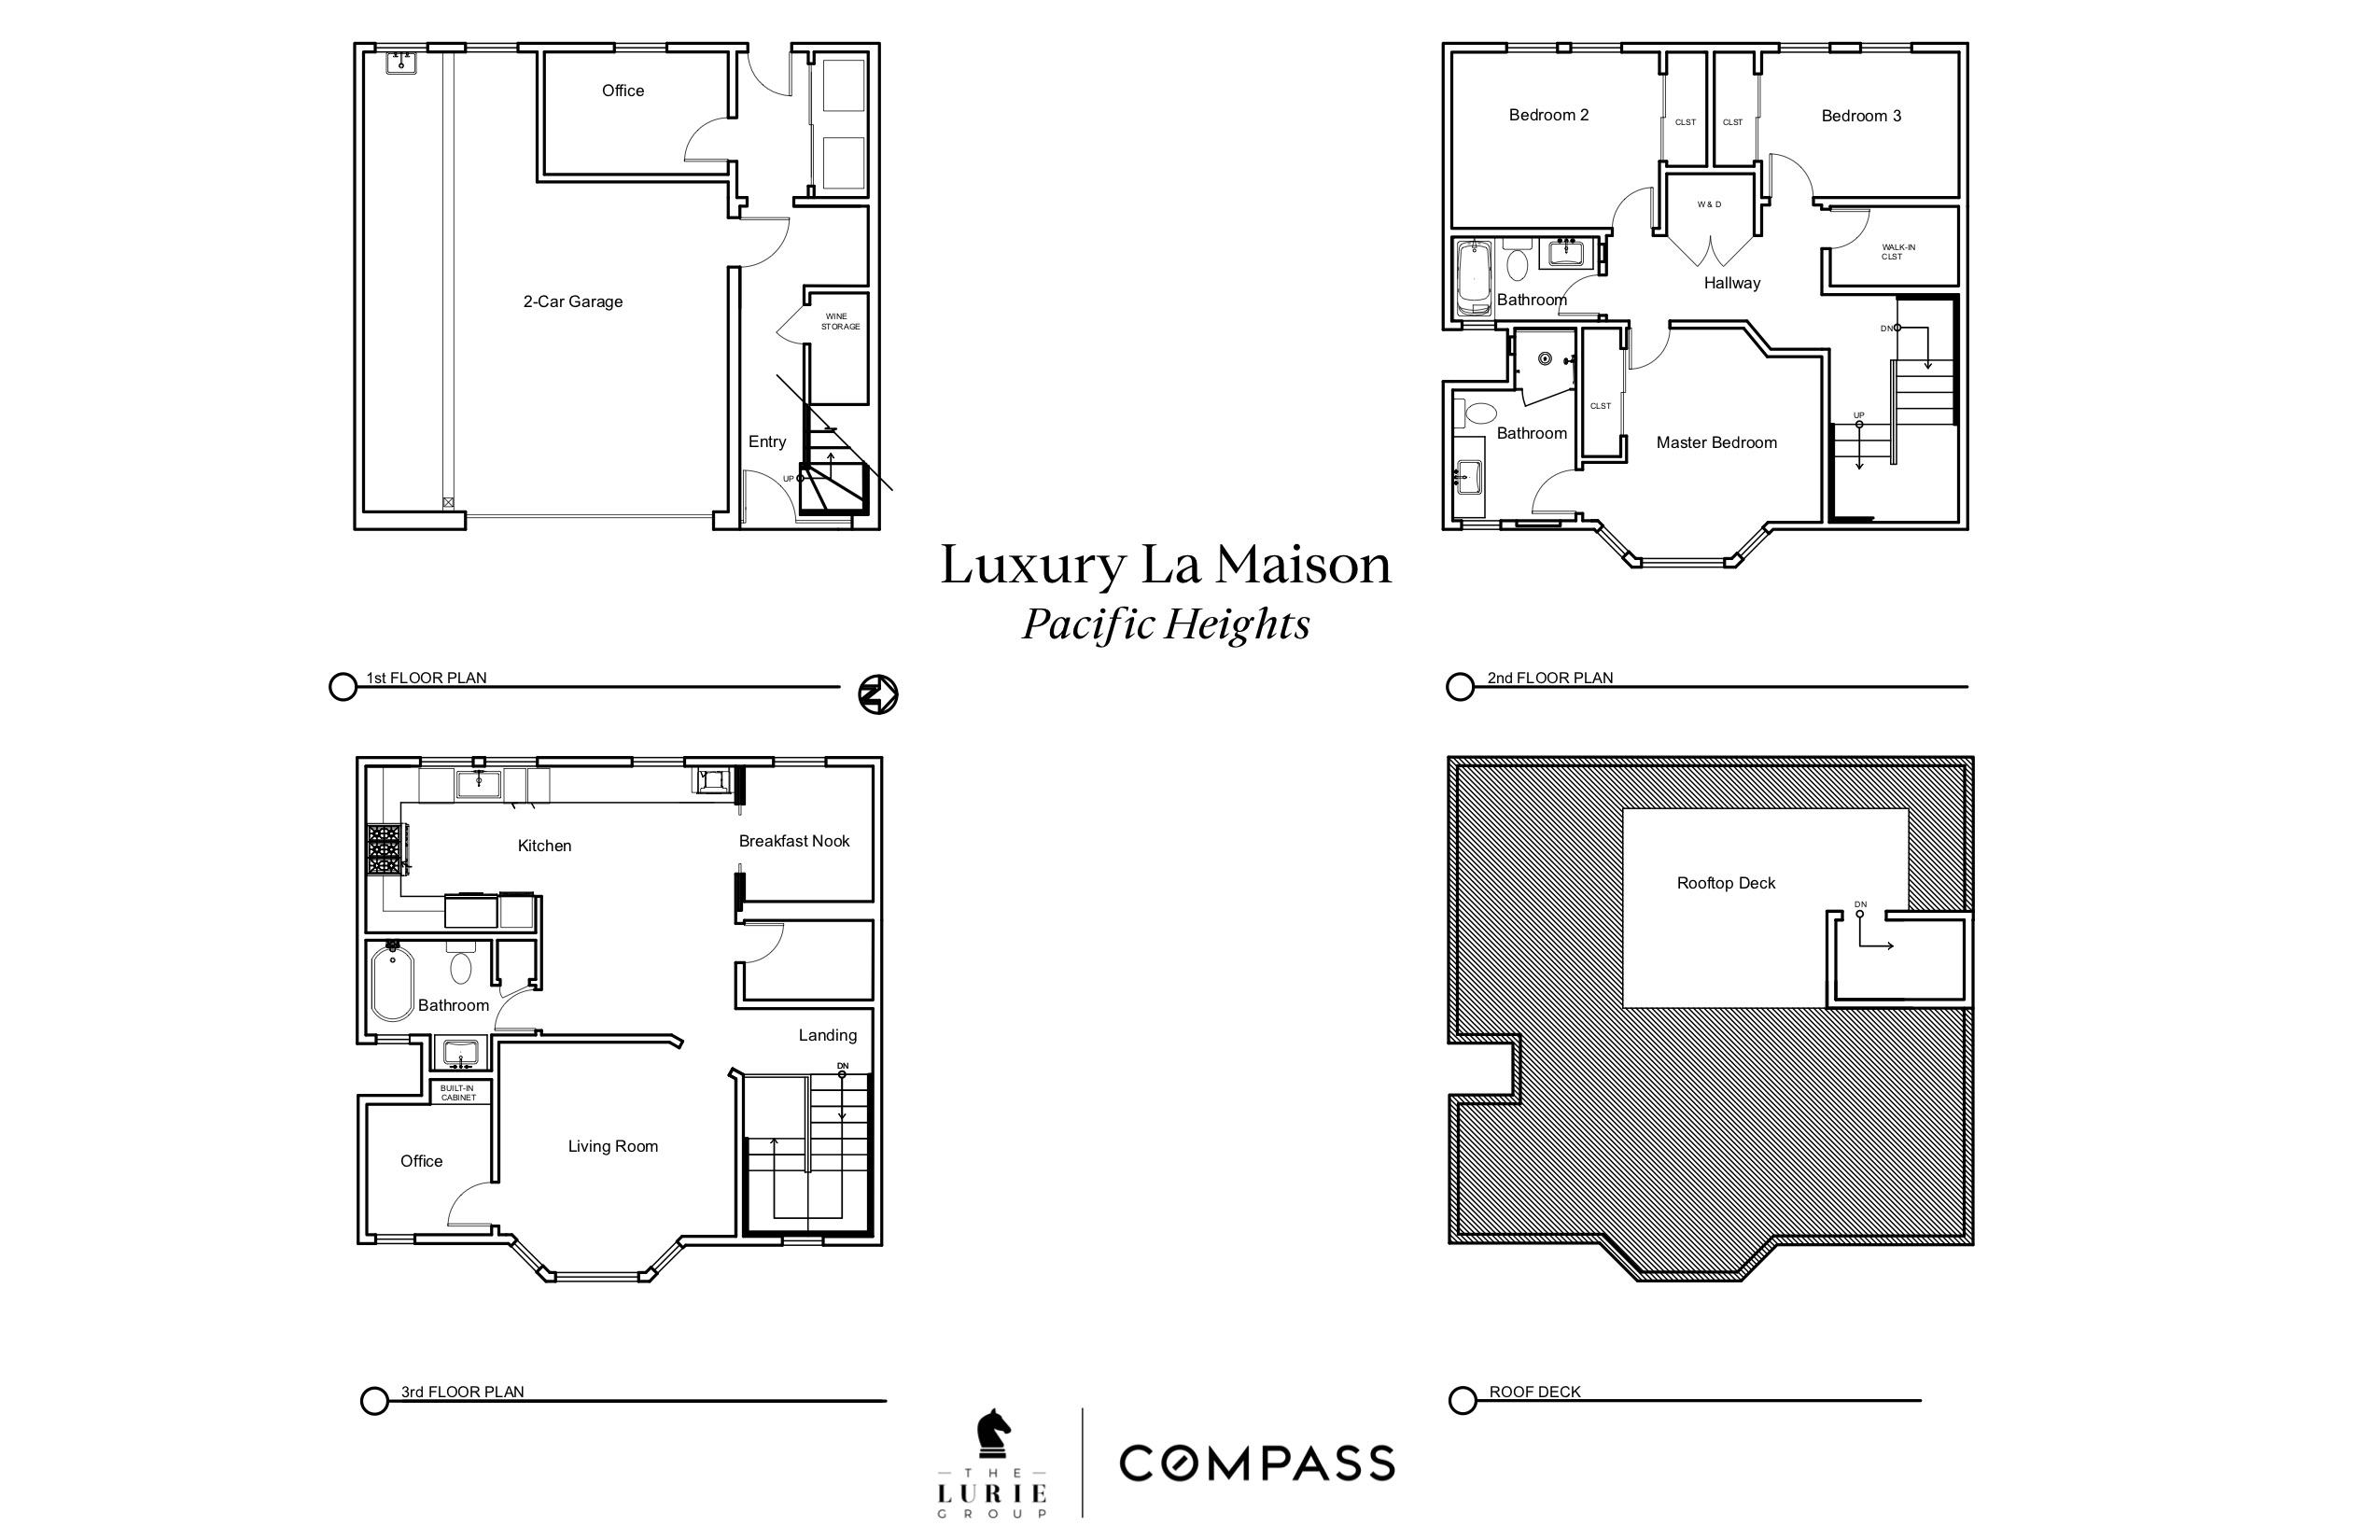 Luxury La Maison FLOOR PLANS (1)